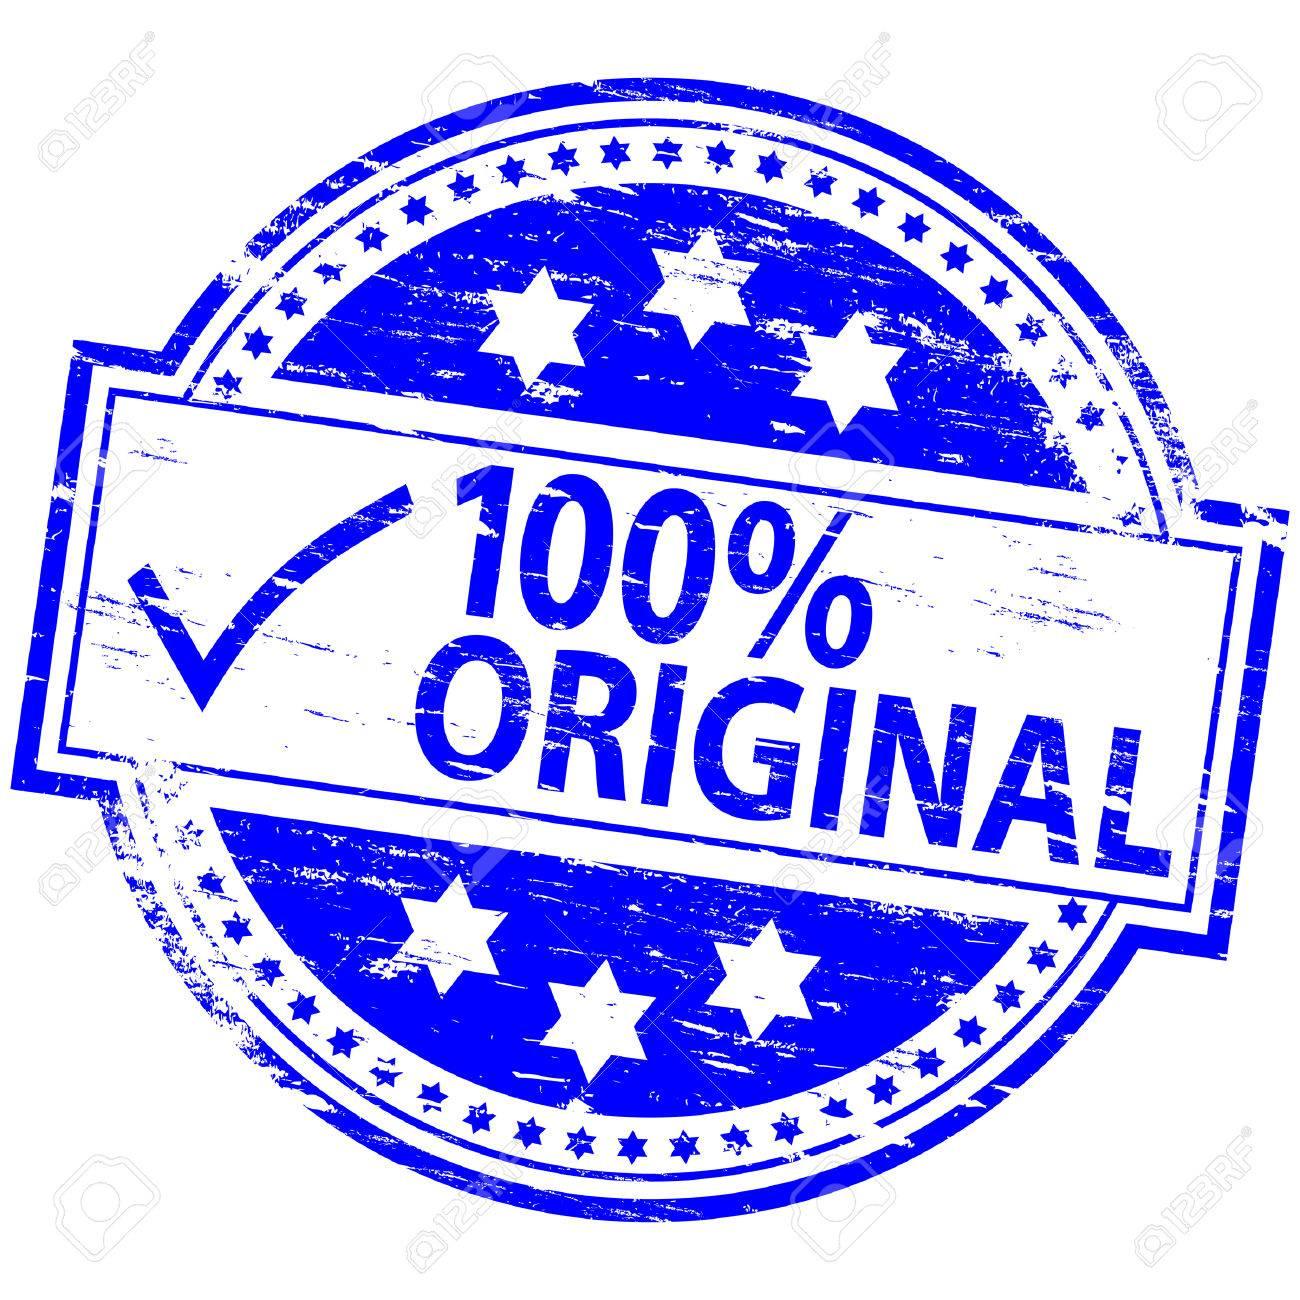 100% ORIGINAL Rubber Stamp Stock Vector - 8898170